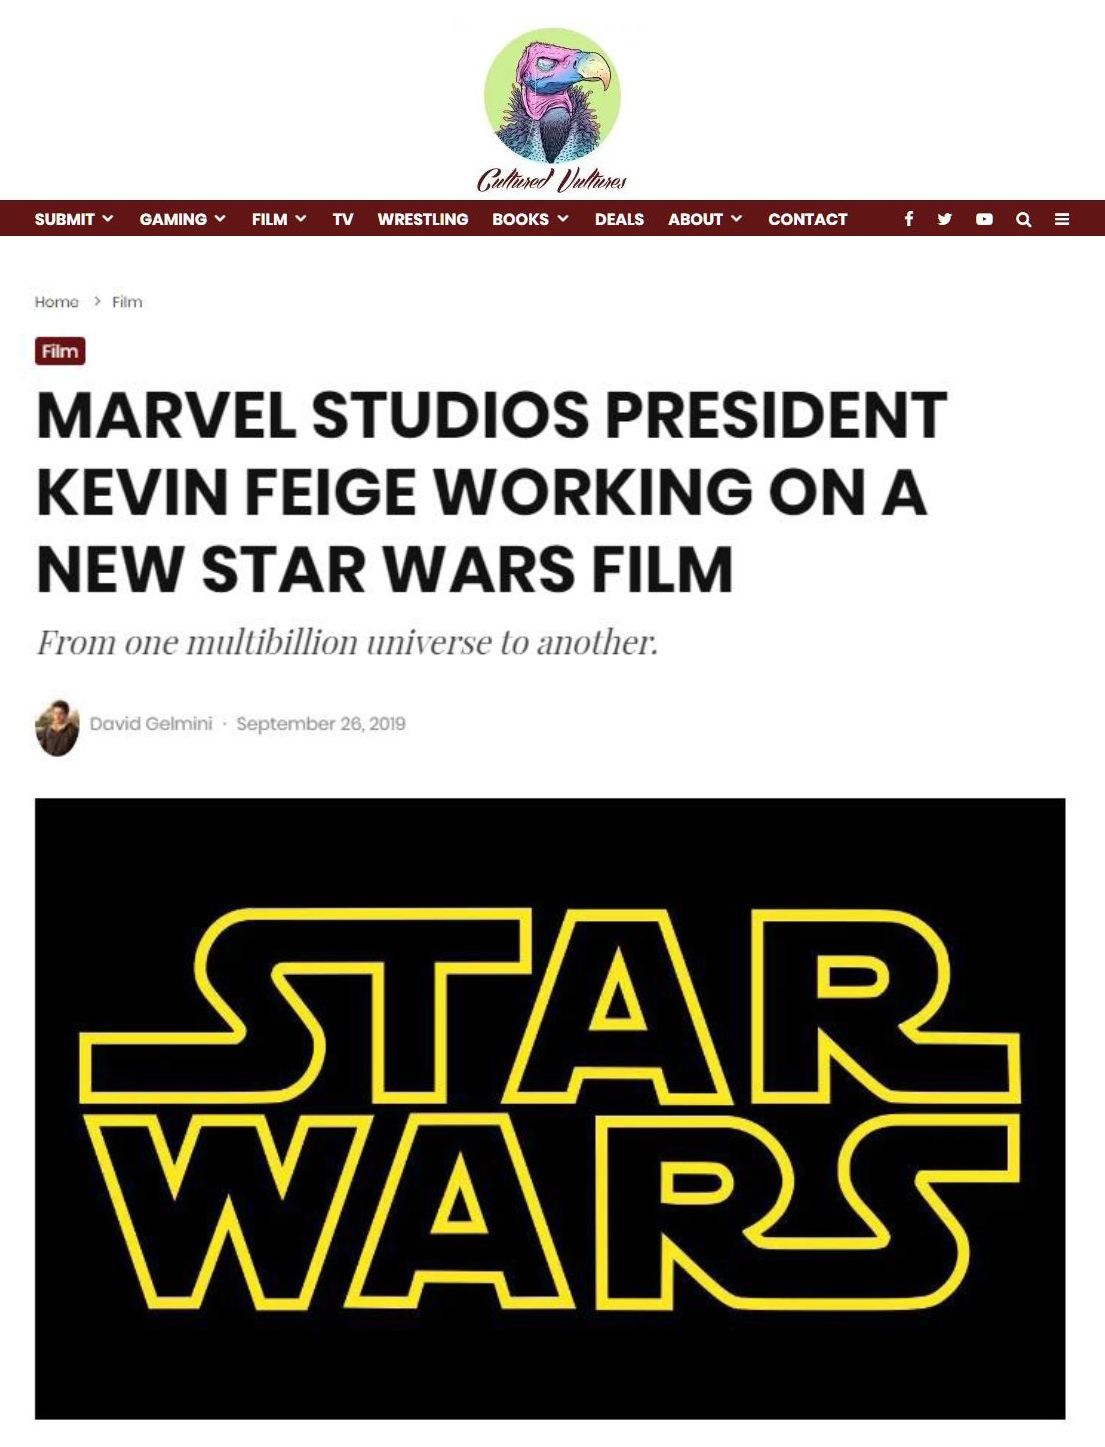 Cultured Vultures: Marvel Studios President Kevin Feige Working on a New Star Wars Film